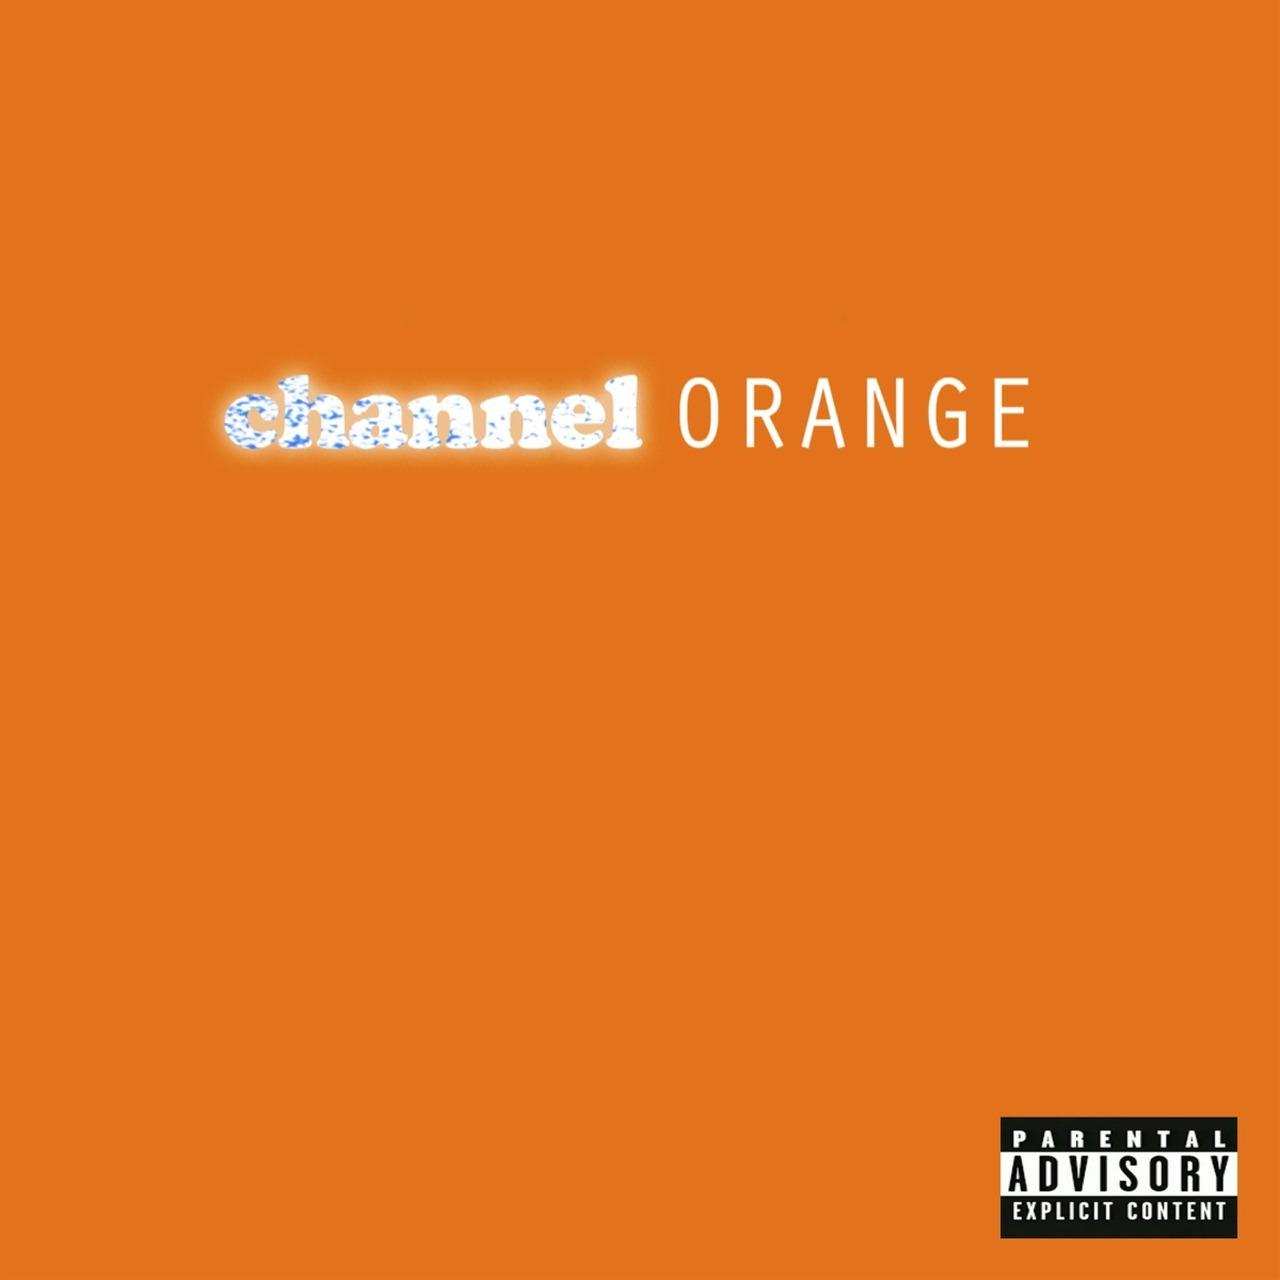 LPBeatdown II >> Ganador: Channel Orange - Frank Ocean [Warrior] - Página 34 Tumblr_m61qlxOiGC1qdrz3yo1_1280